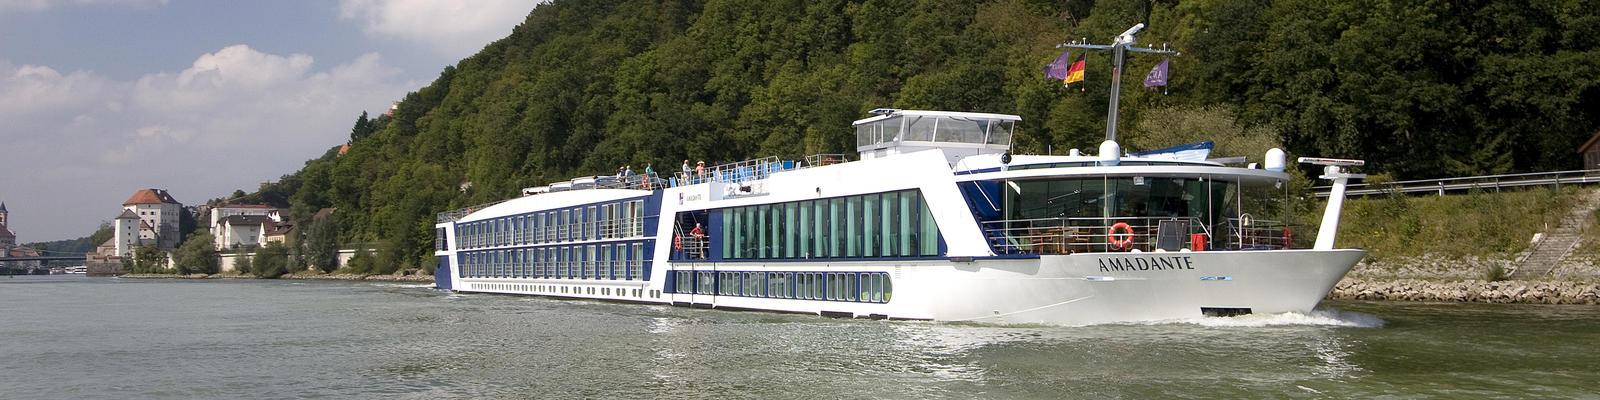 Amawaterways Amadante Cruise Ship Review Photos